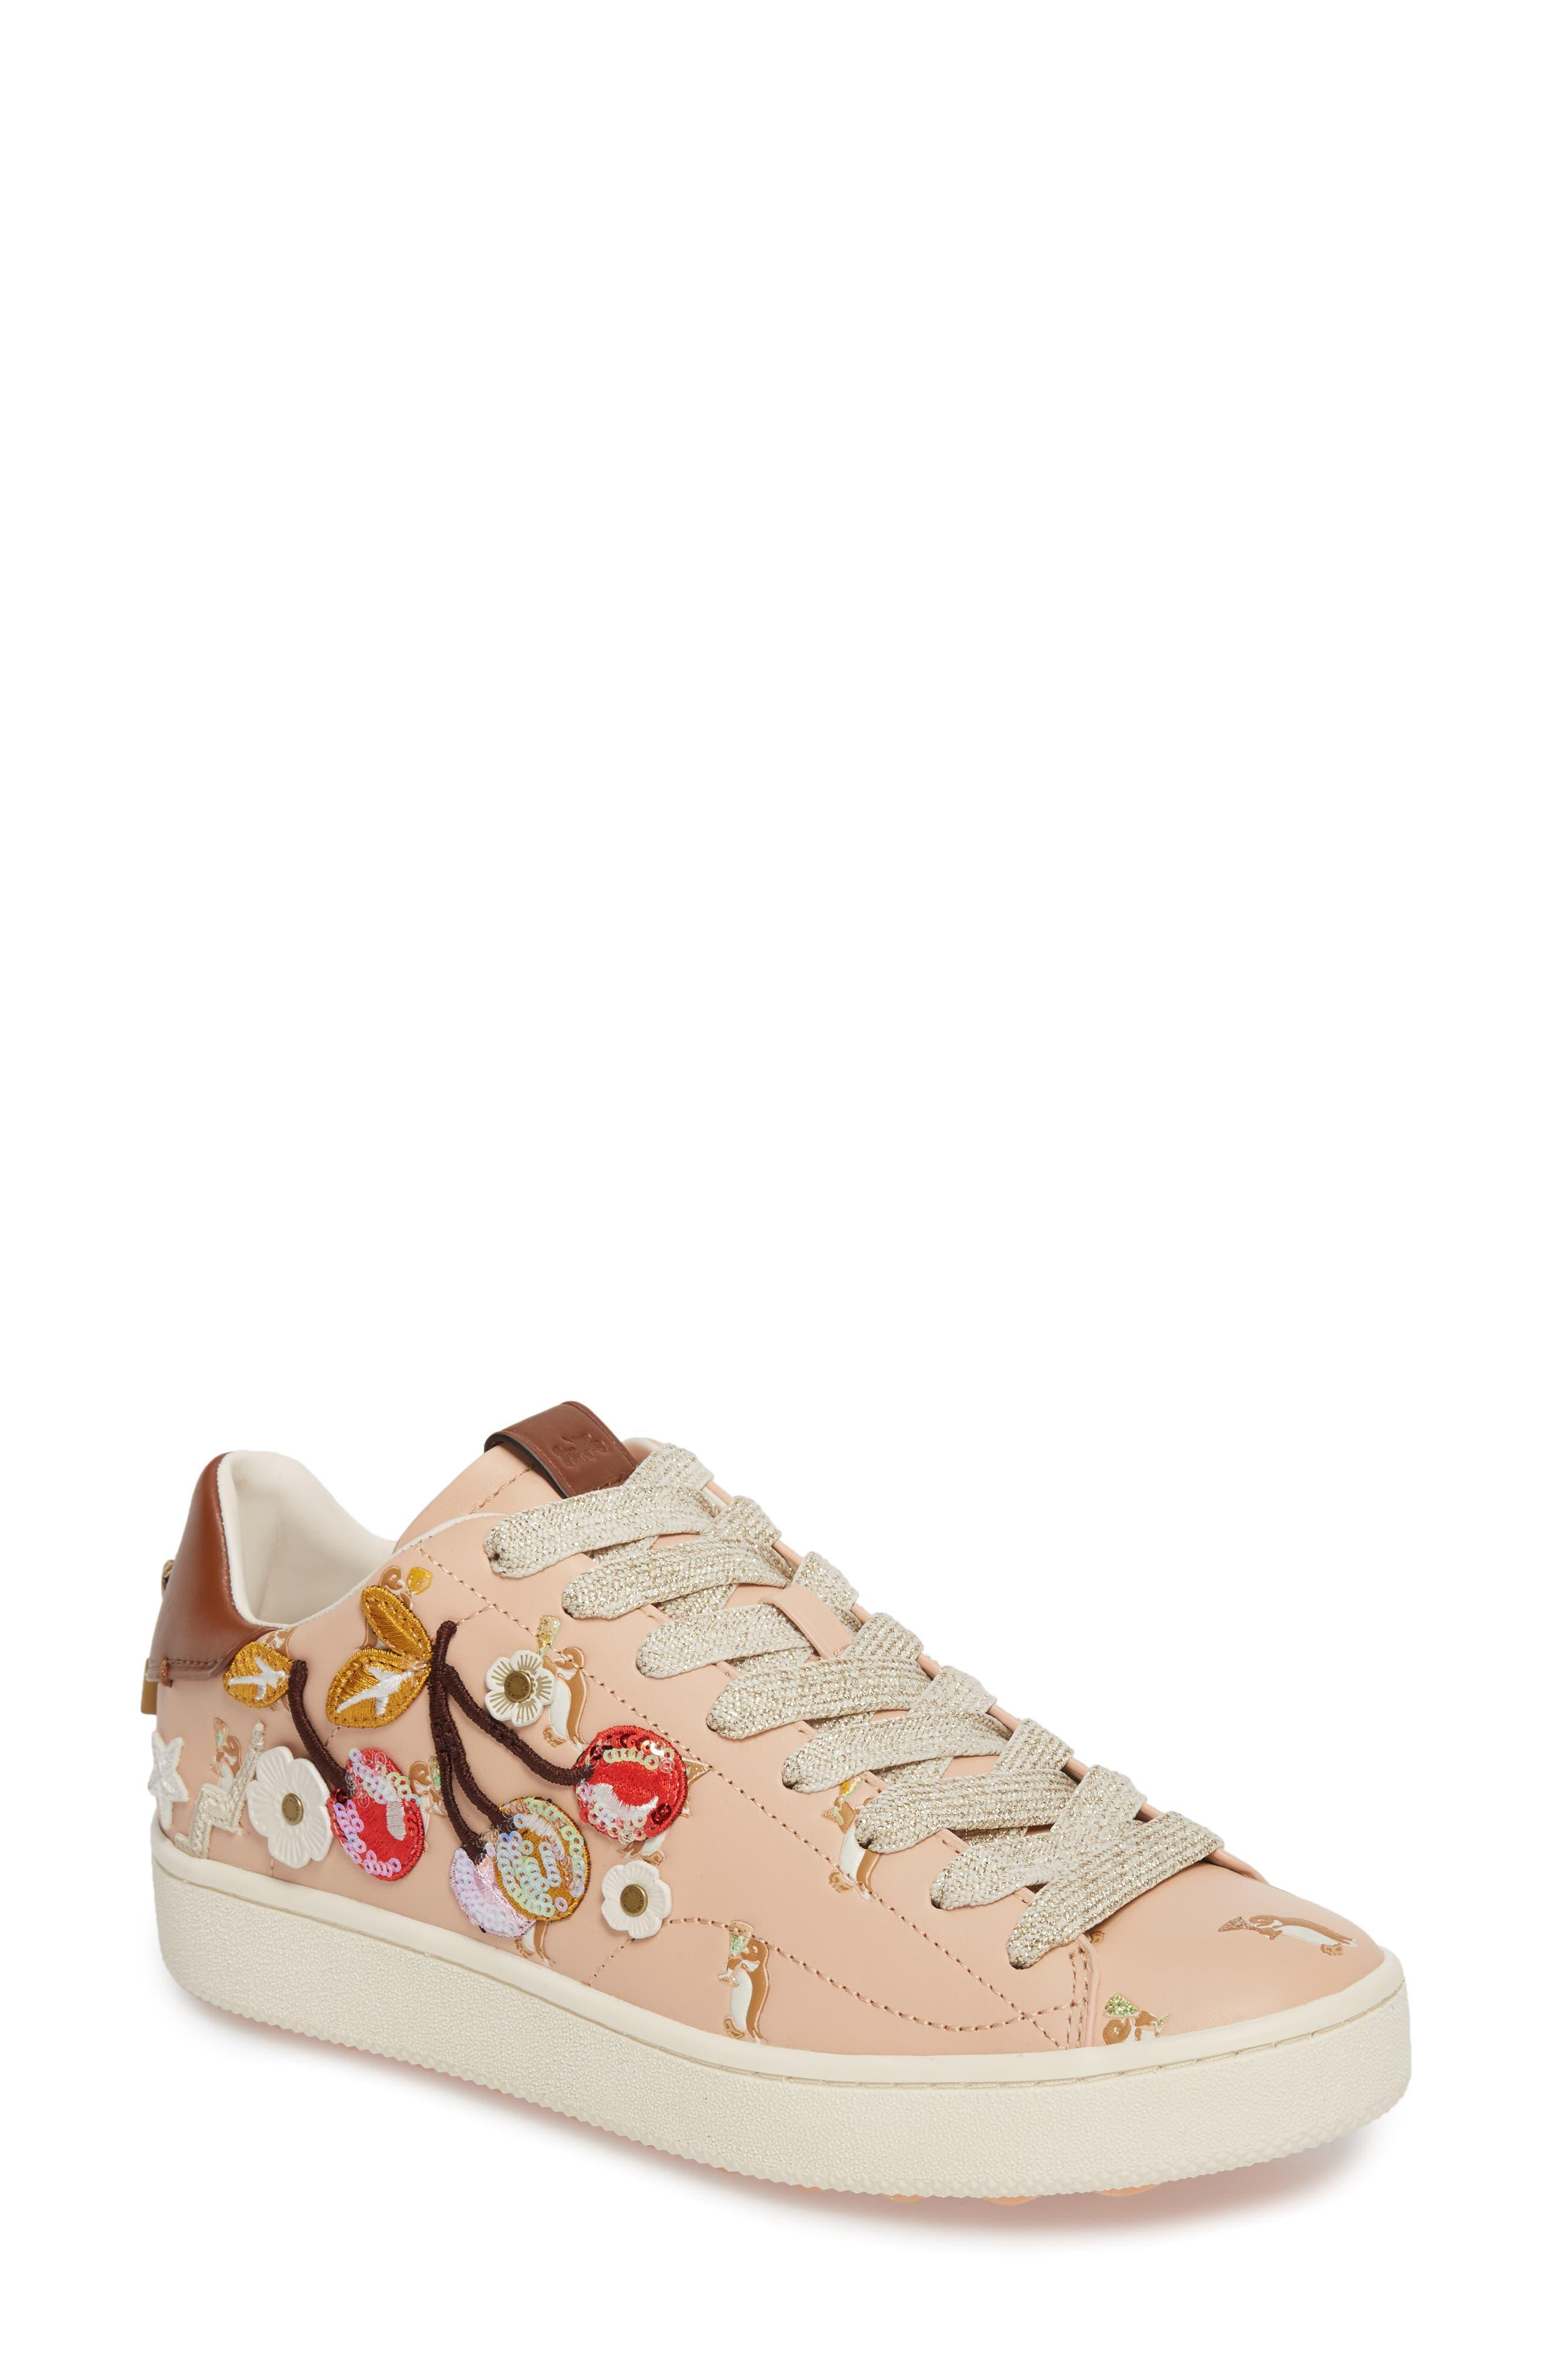 Patch Sneaker,                             Main thumbnail 1, color,                             650